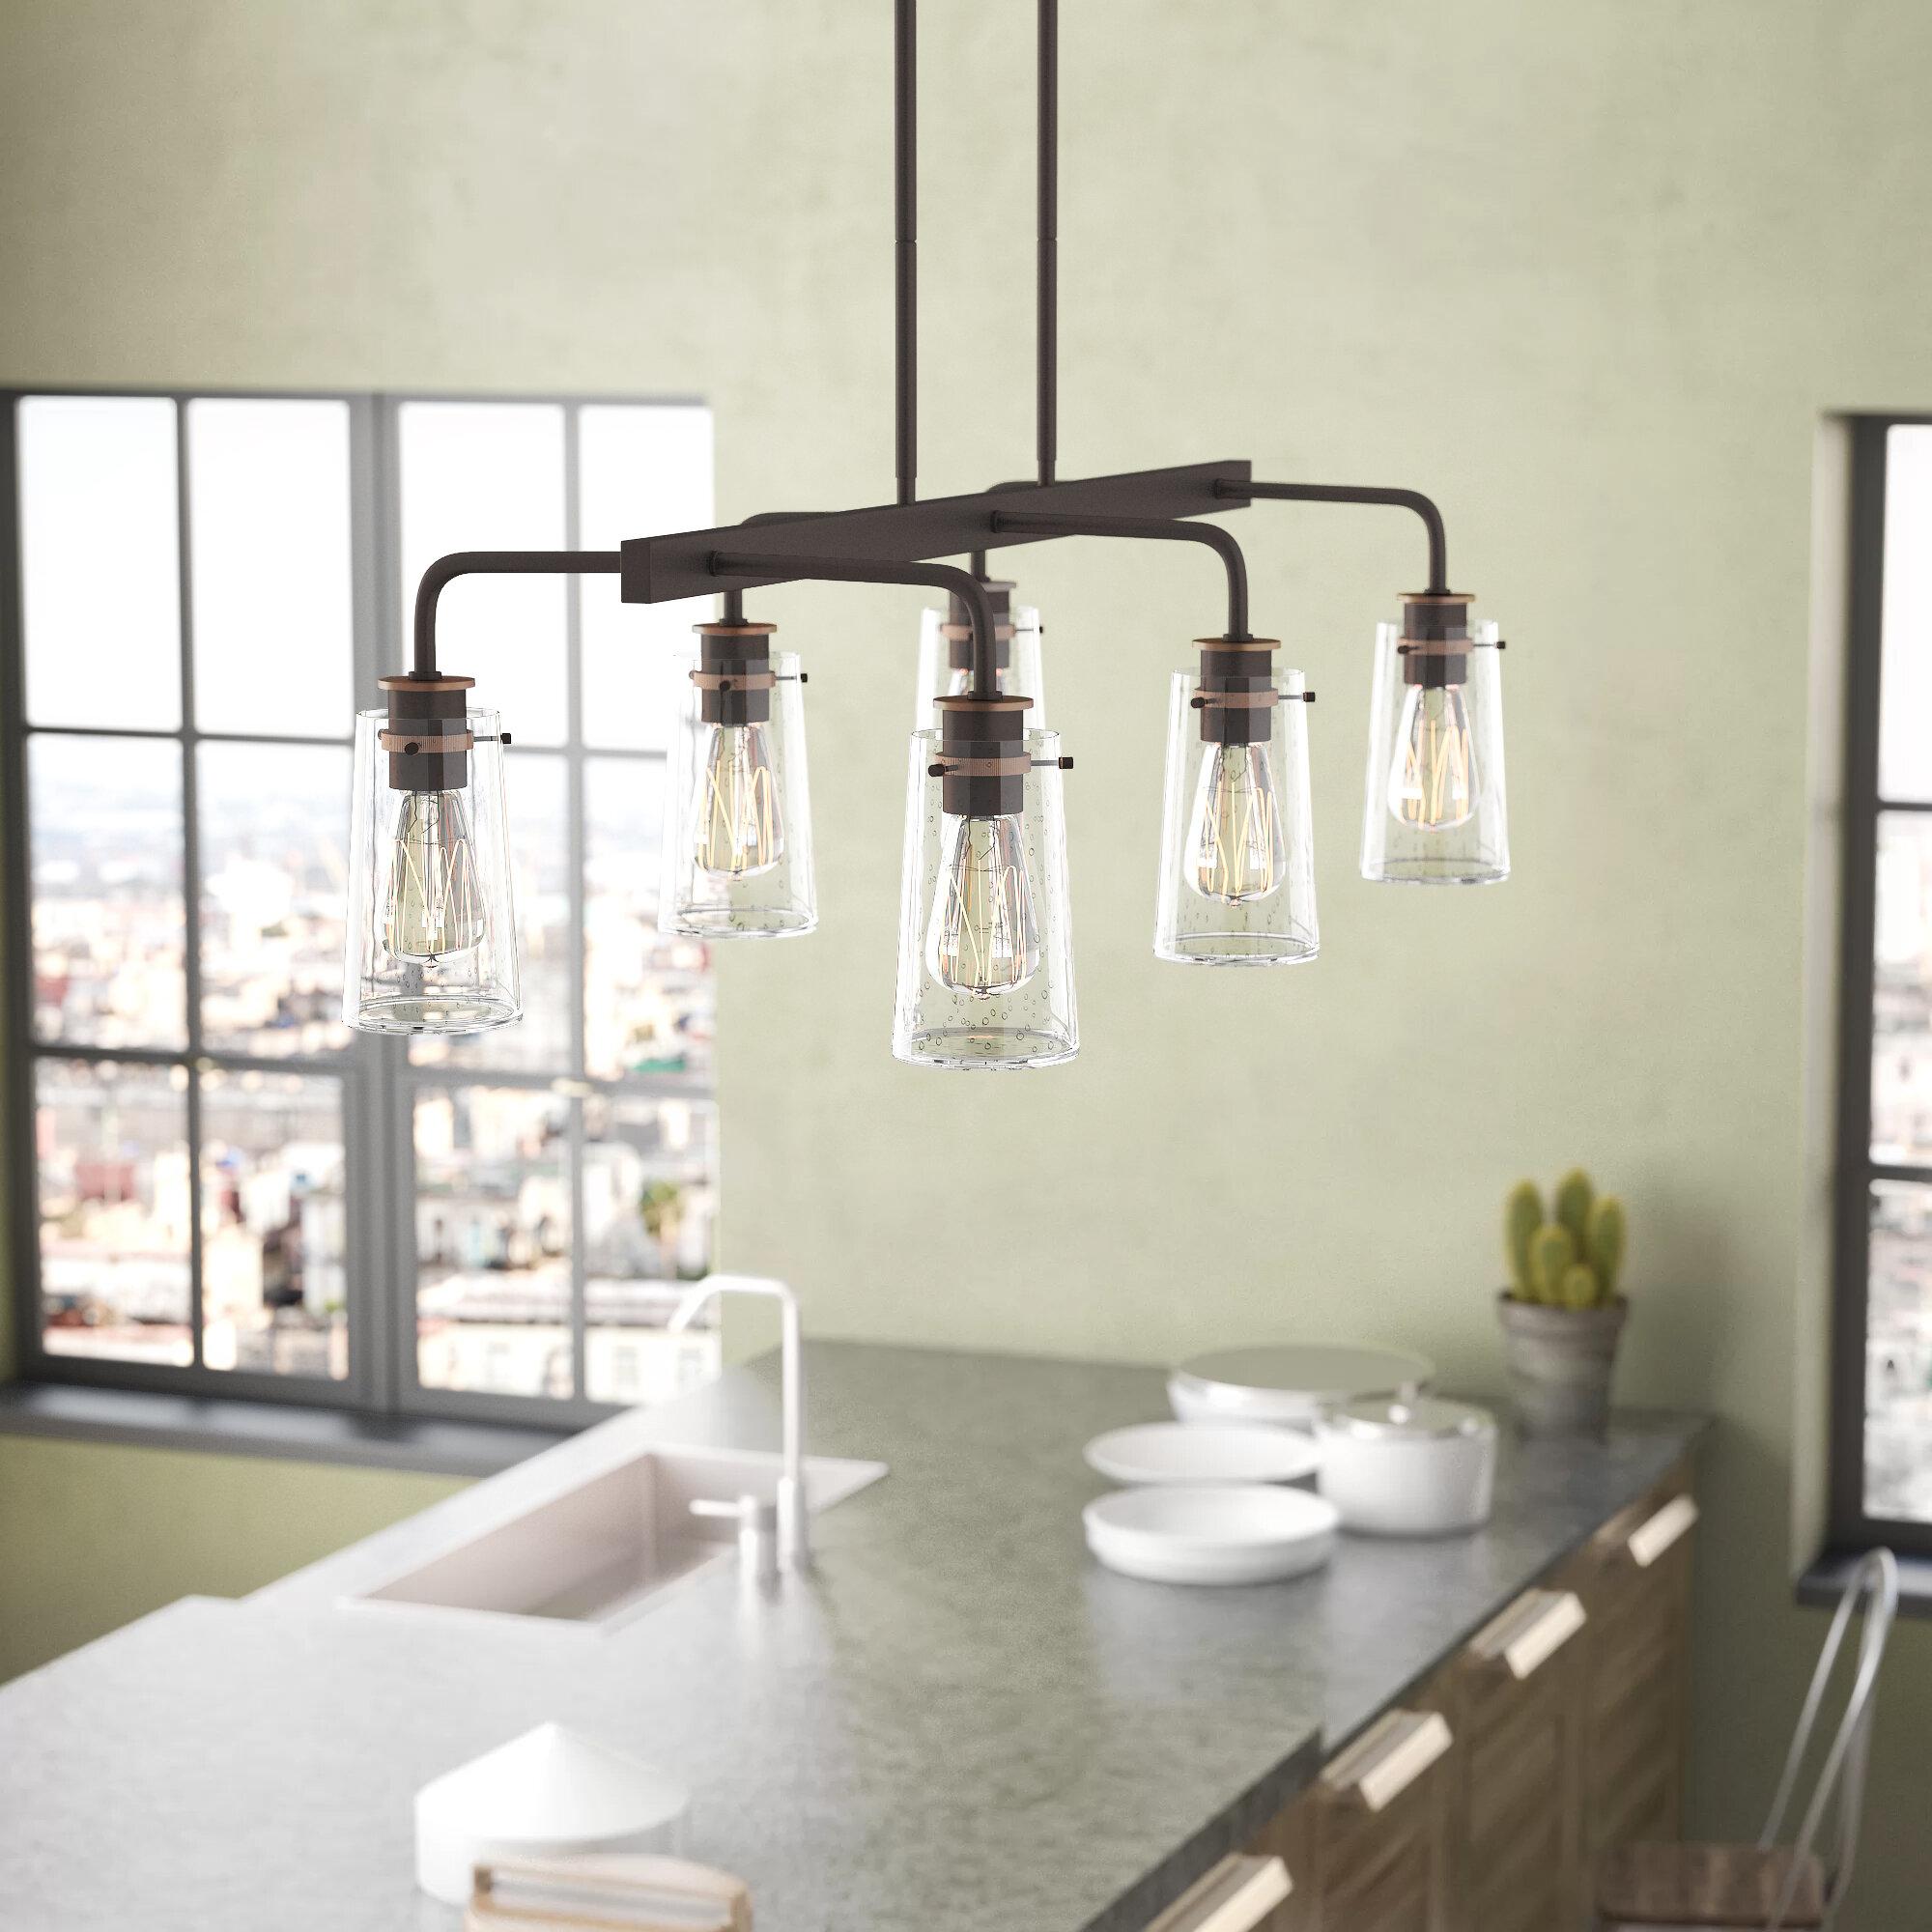 Fruita Linear 6-Light Kitchen Island Pendant